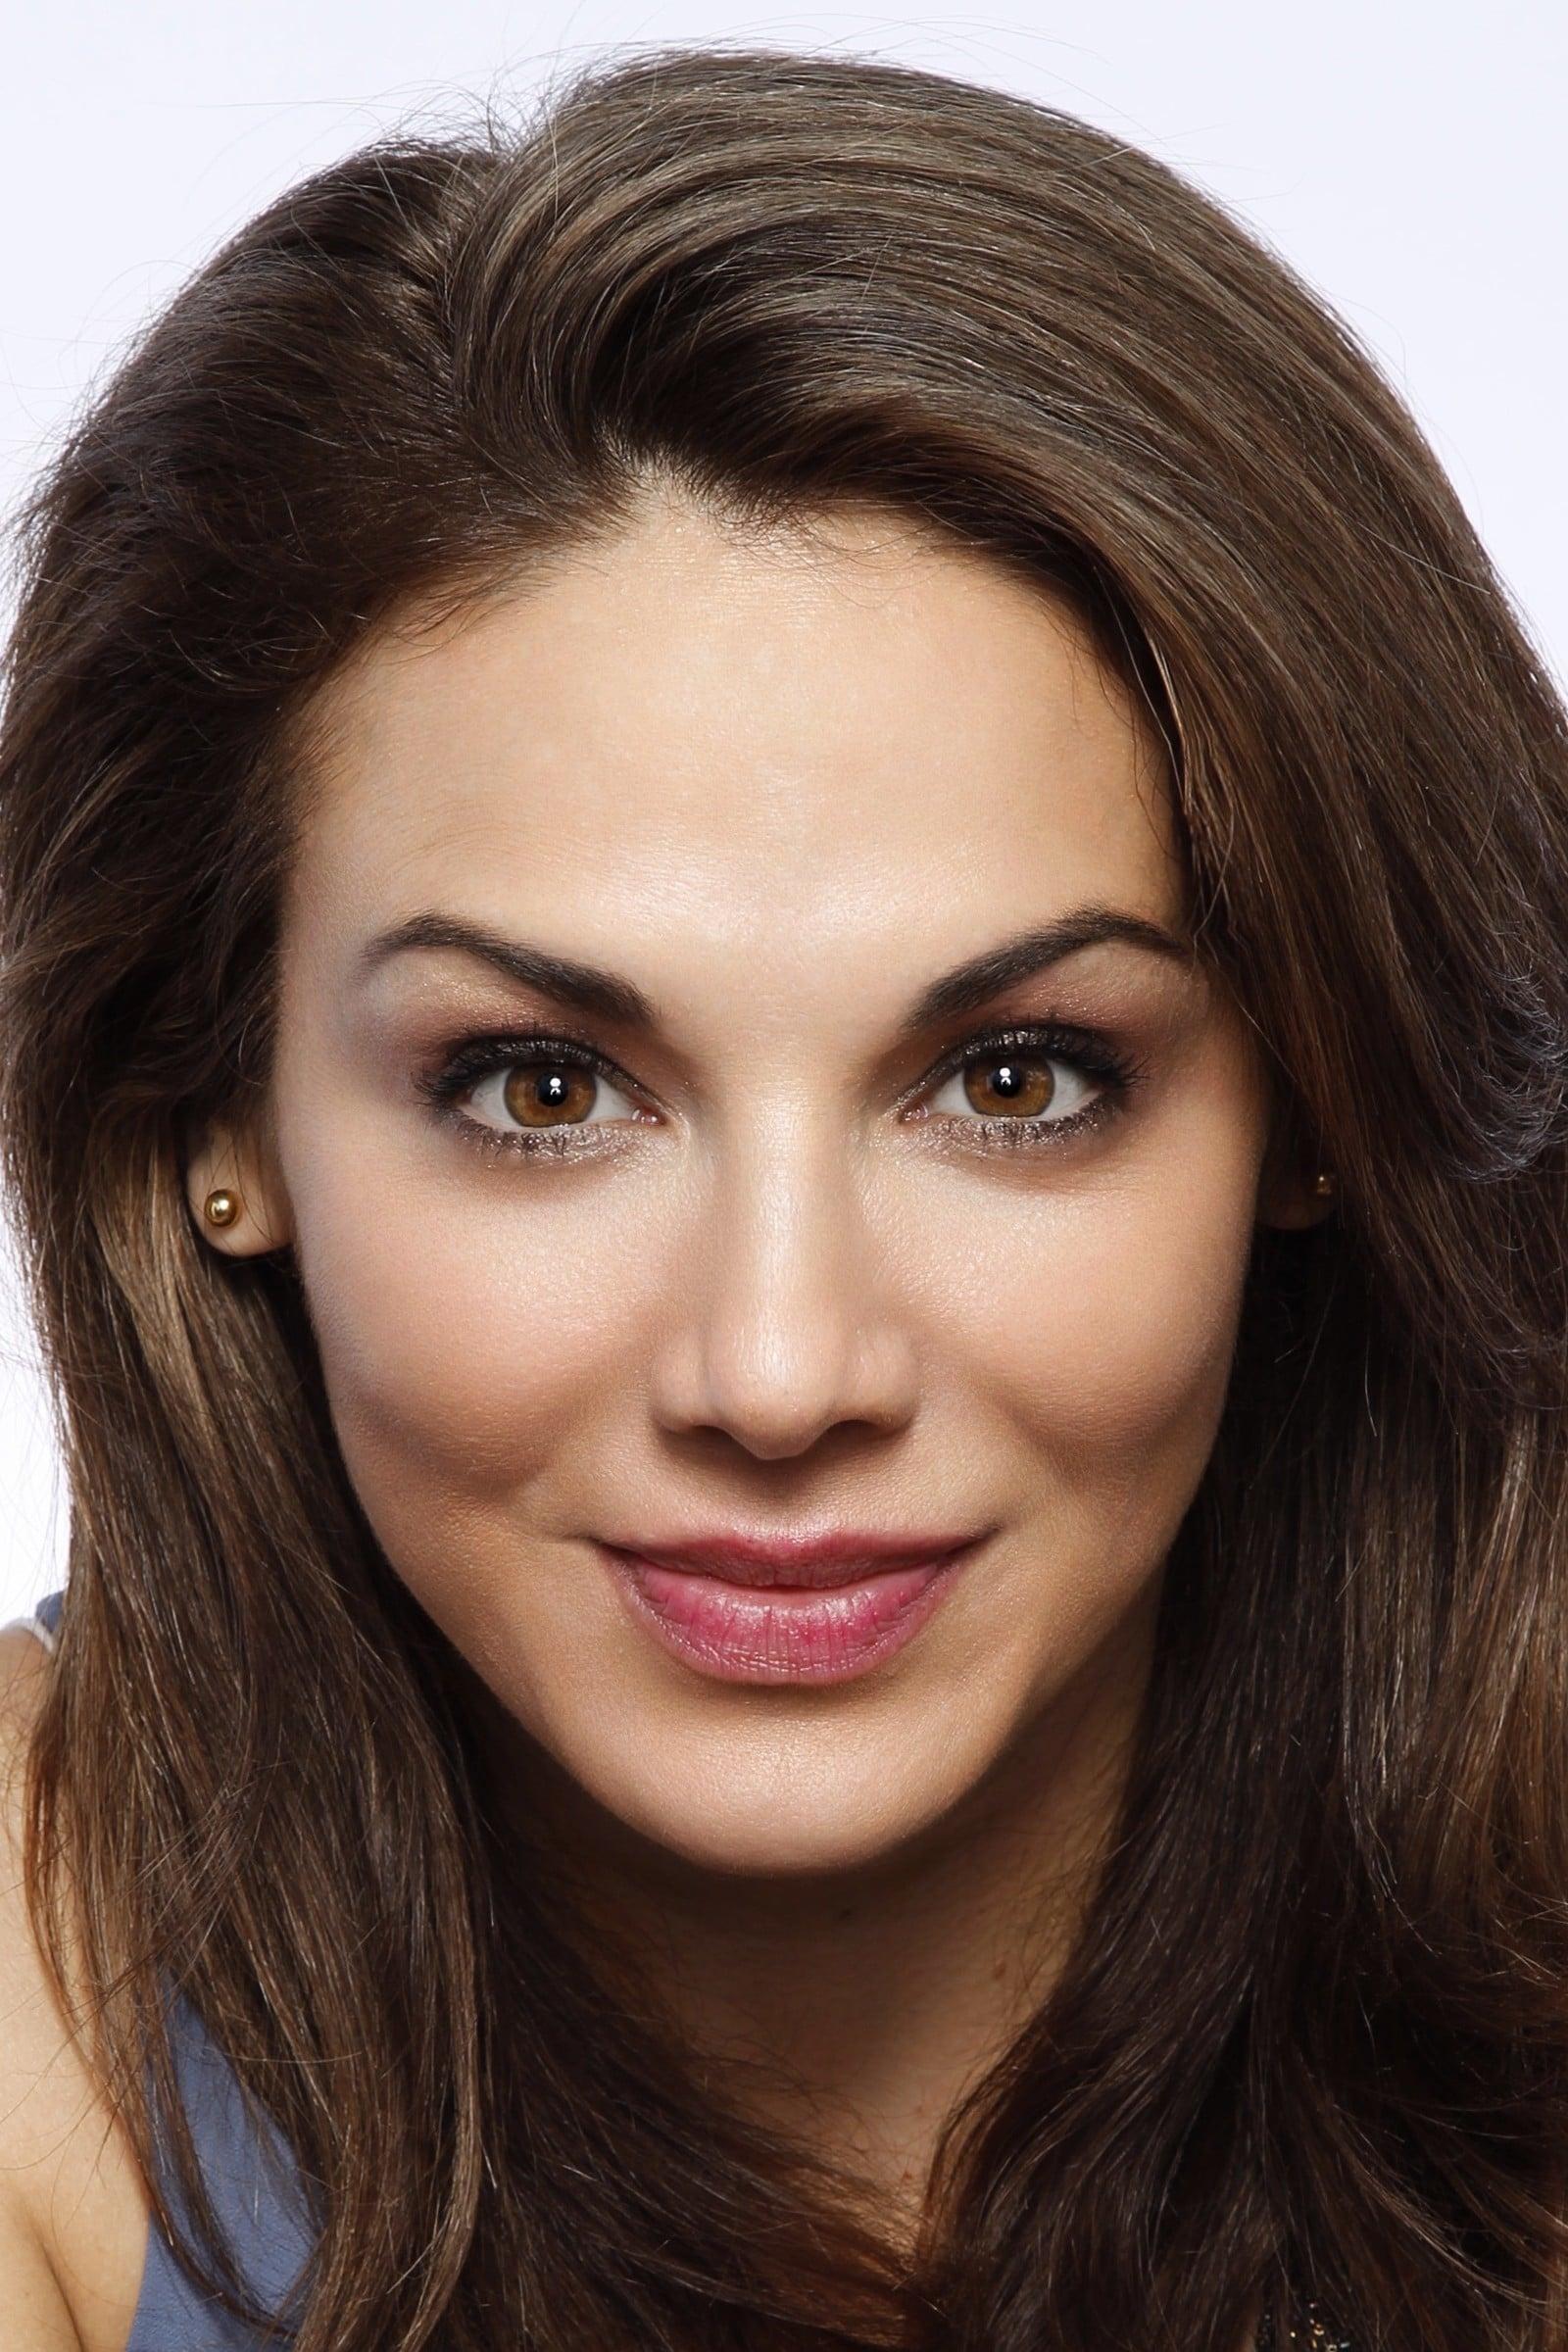 Jill-Michele Meleán